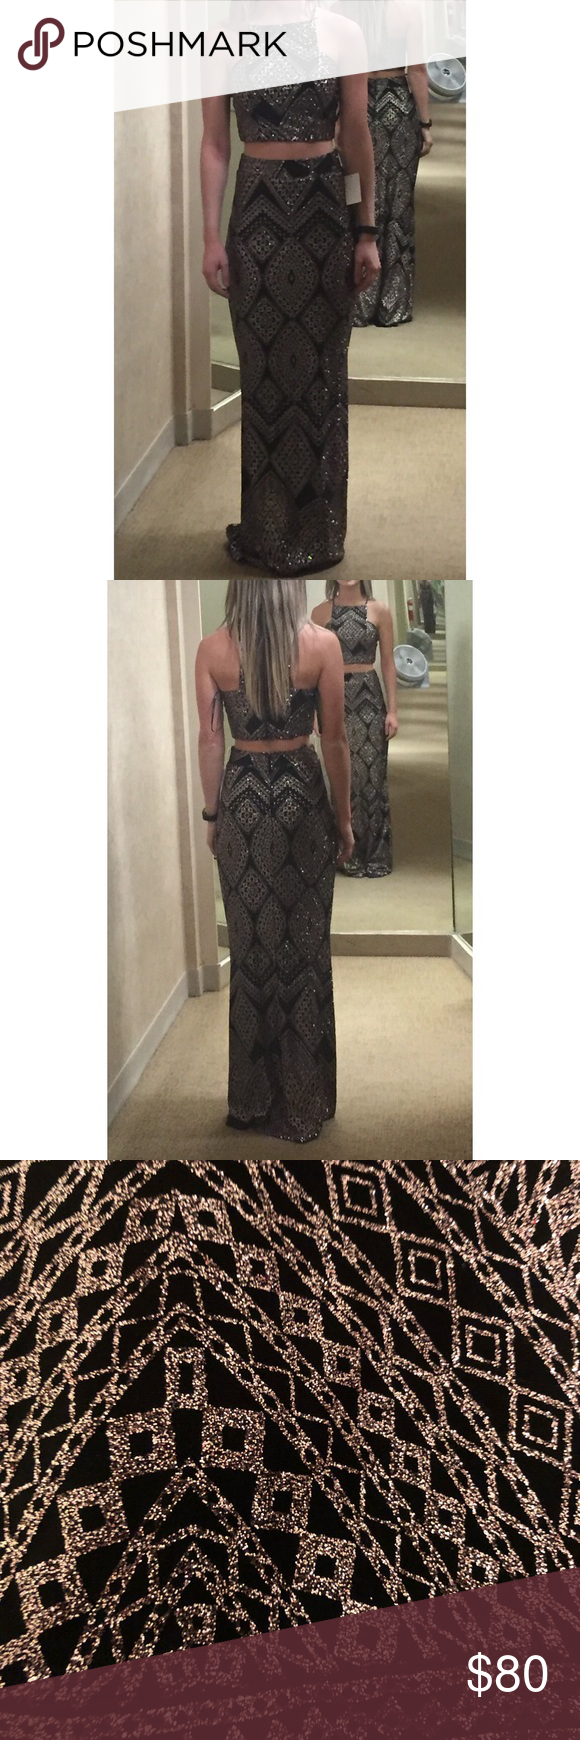 Gold and black glitter tribal formal dress nwt